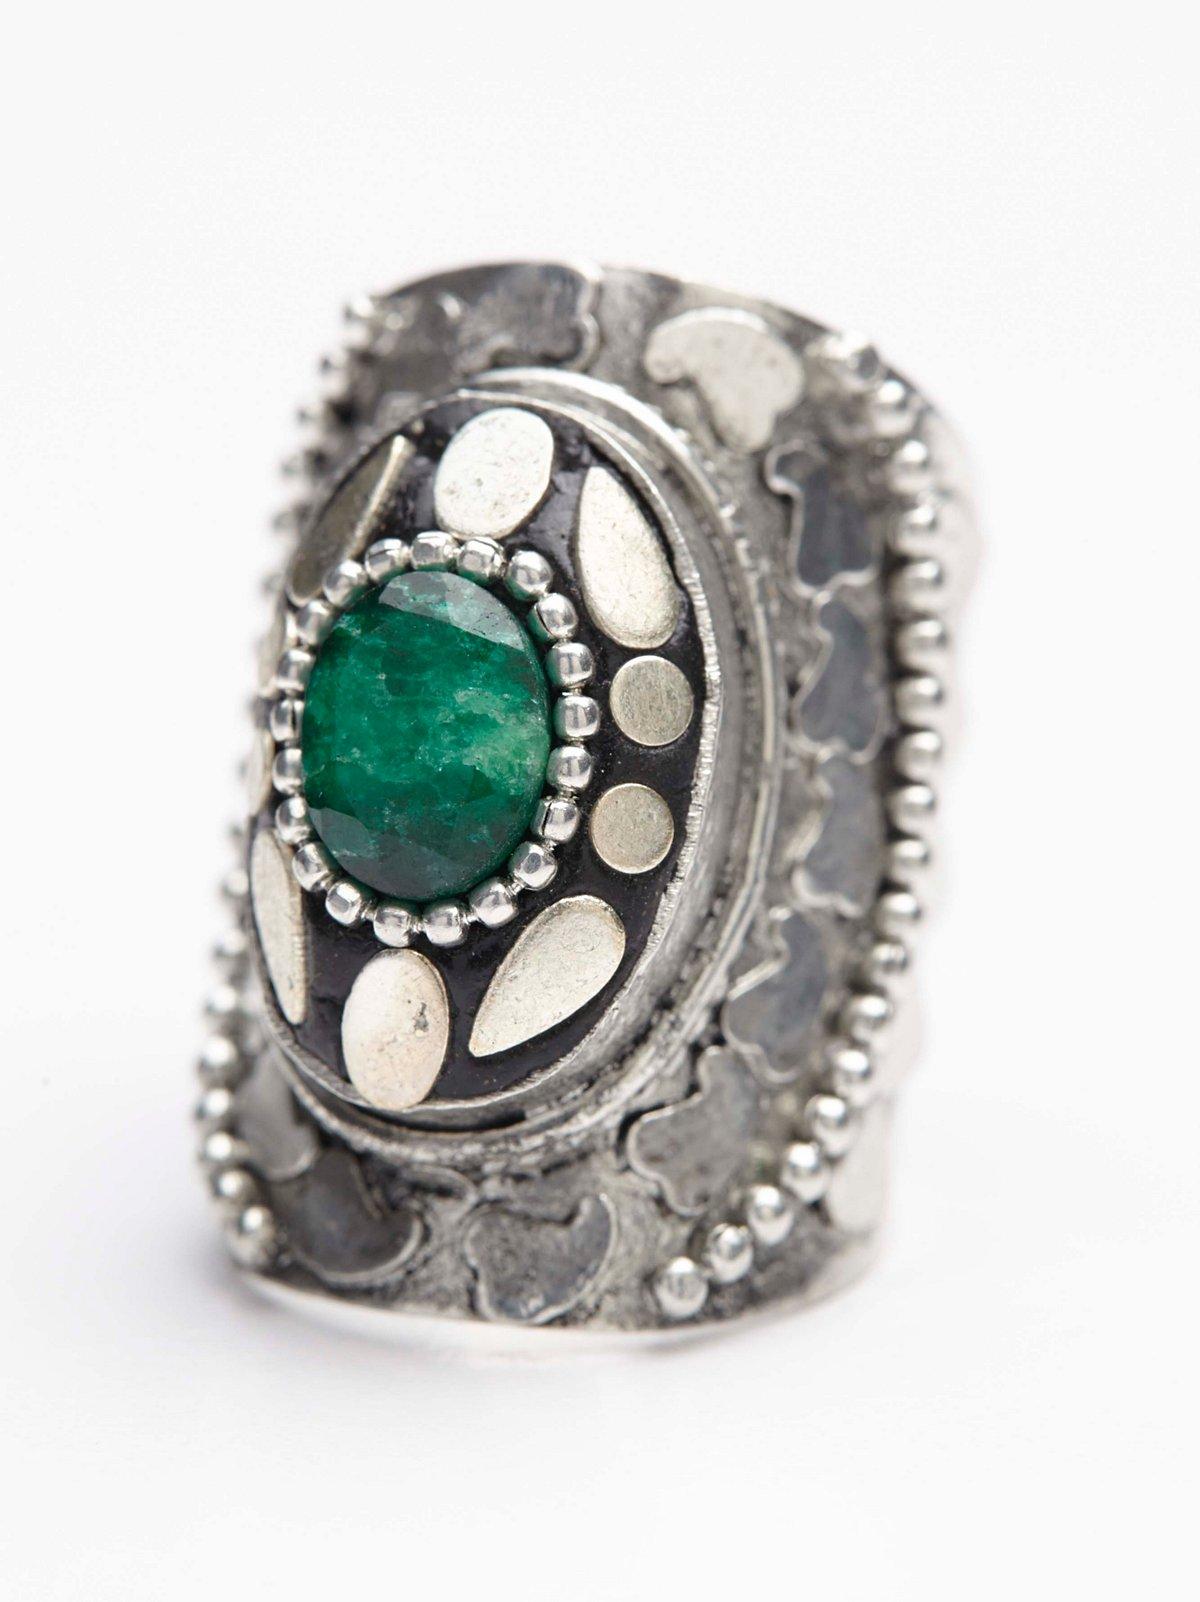 Radial宝石戒指